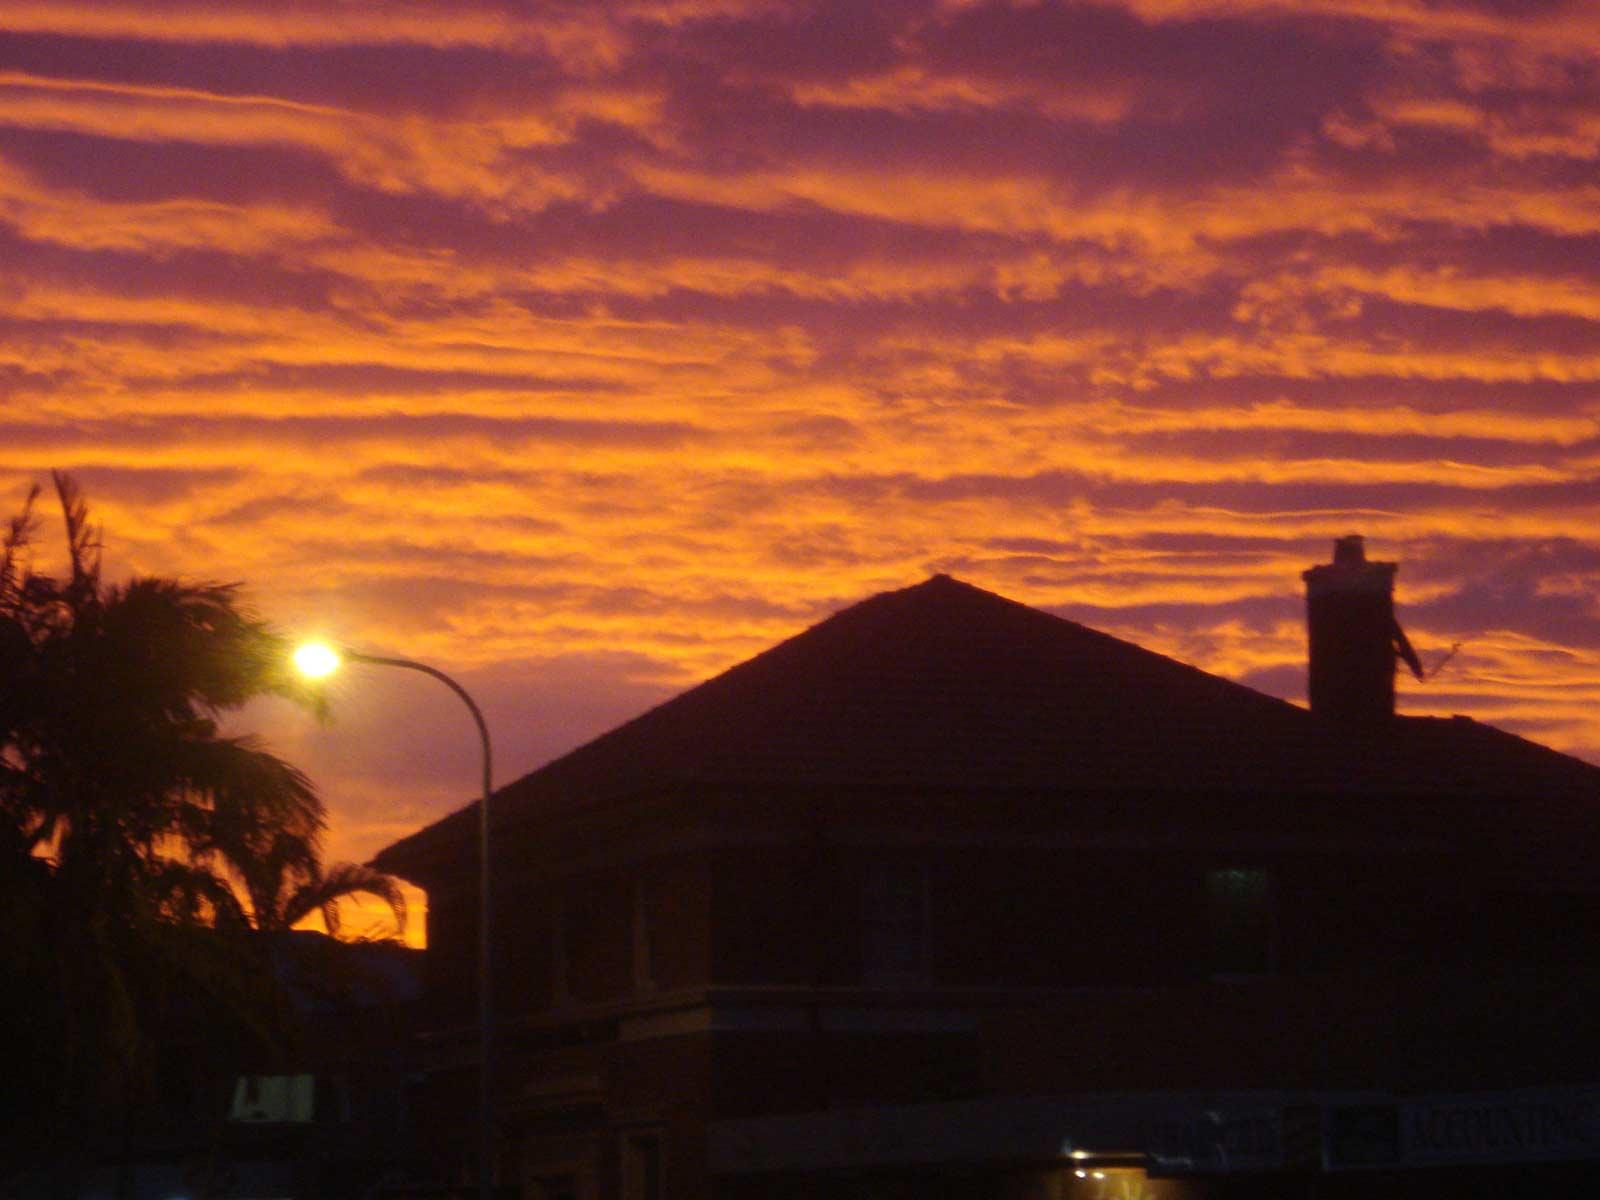 Mullumbimby Sunset Wordpressit